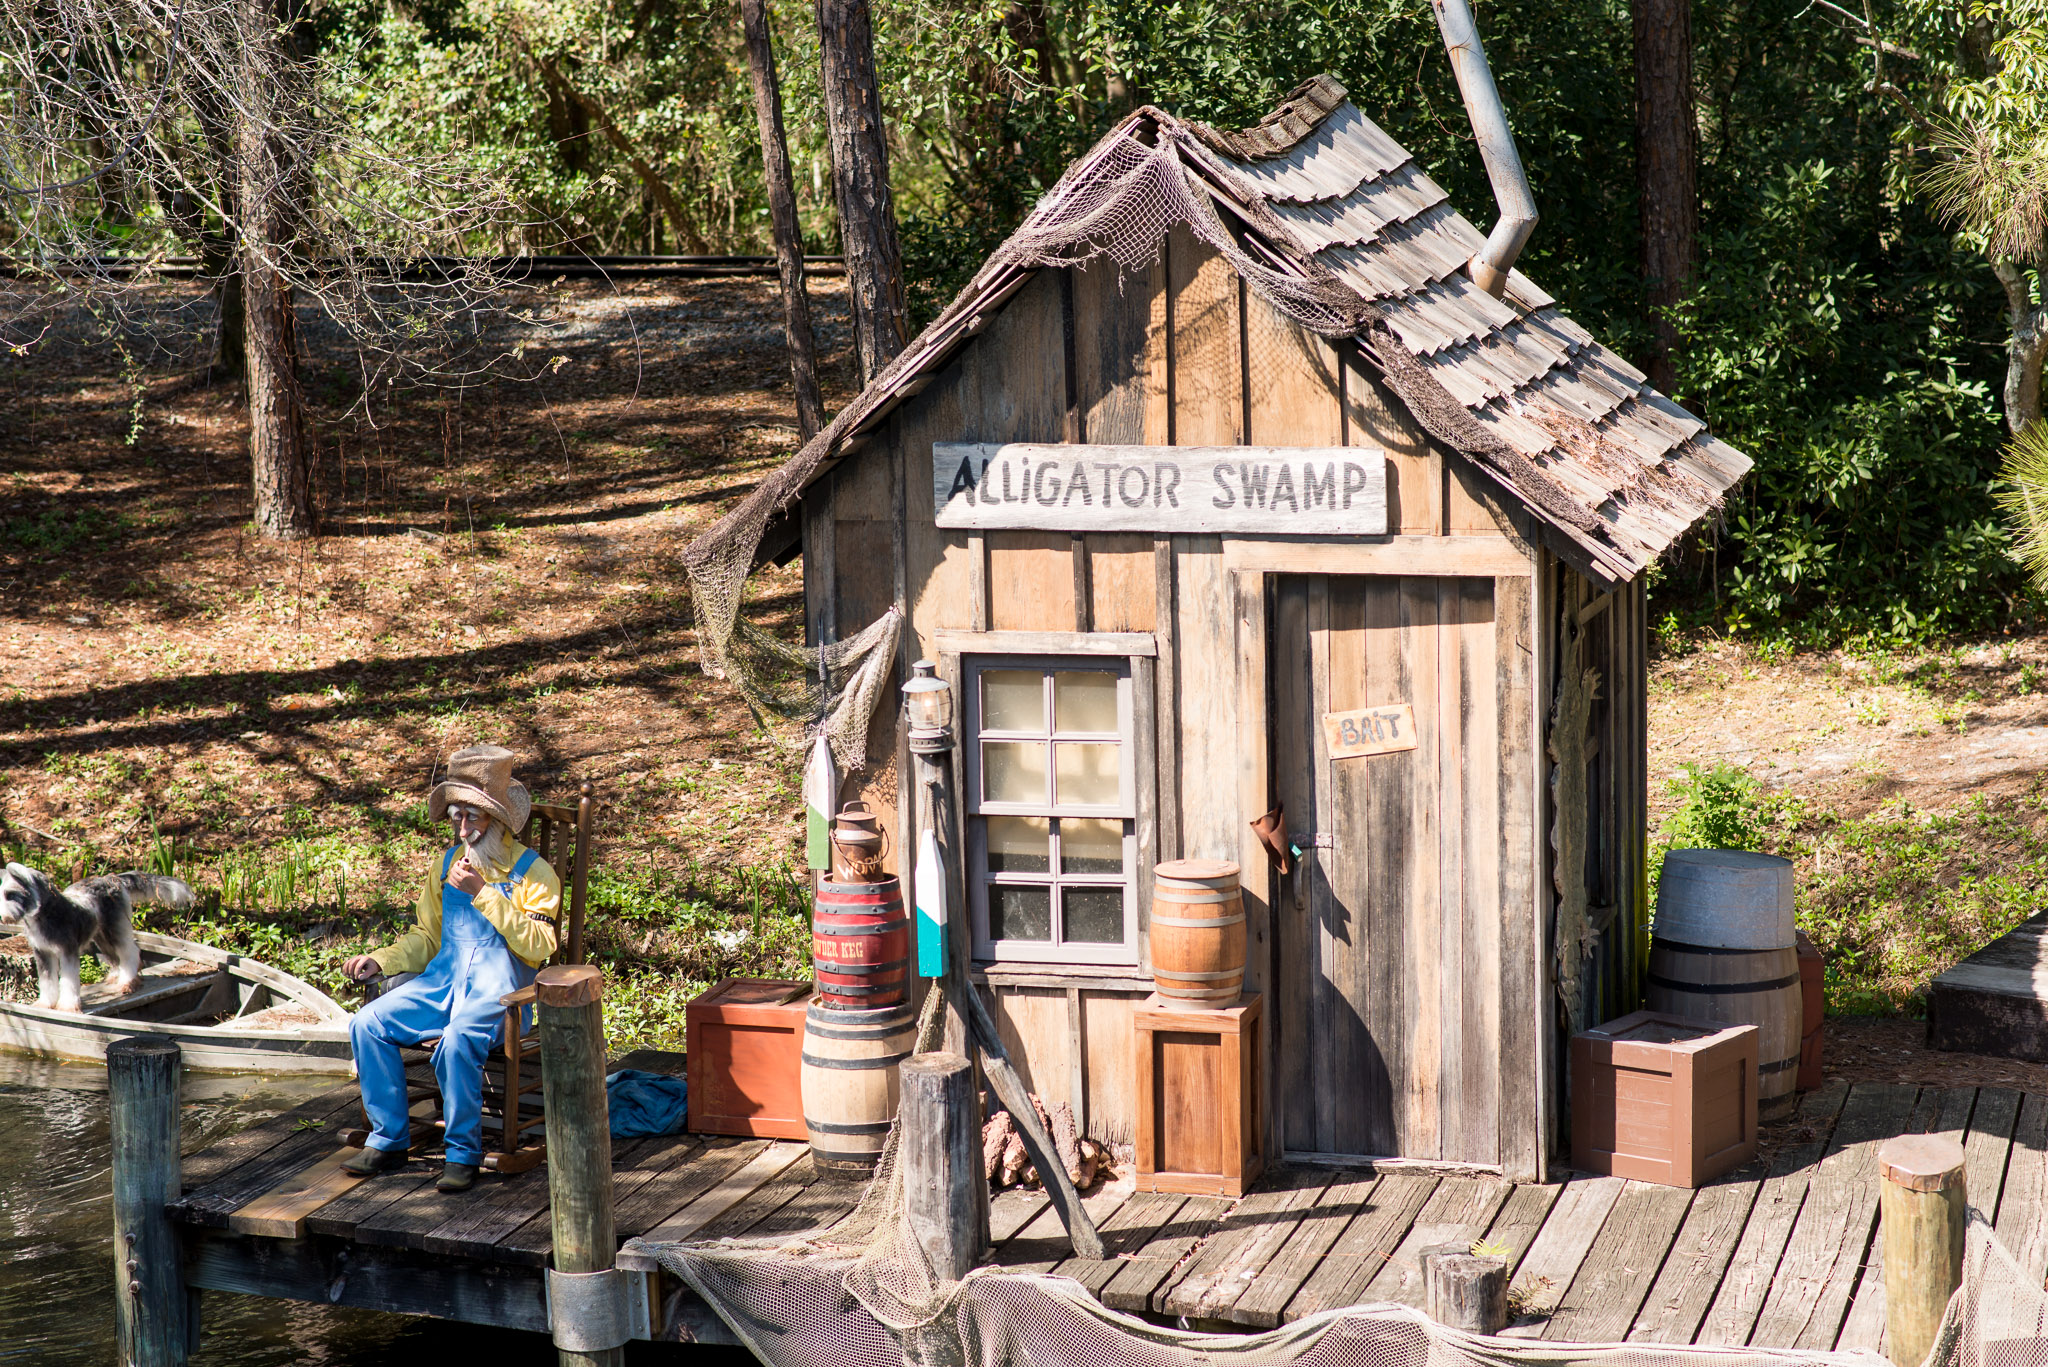 Alligator Swamp - Walt Disney World Magic Kingdom